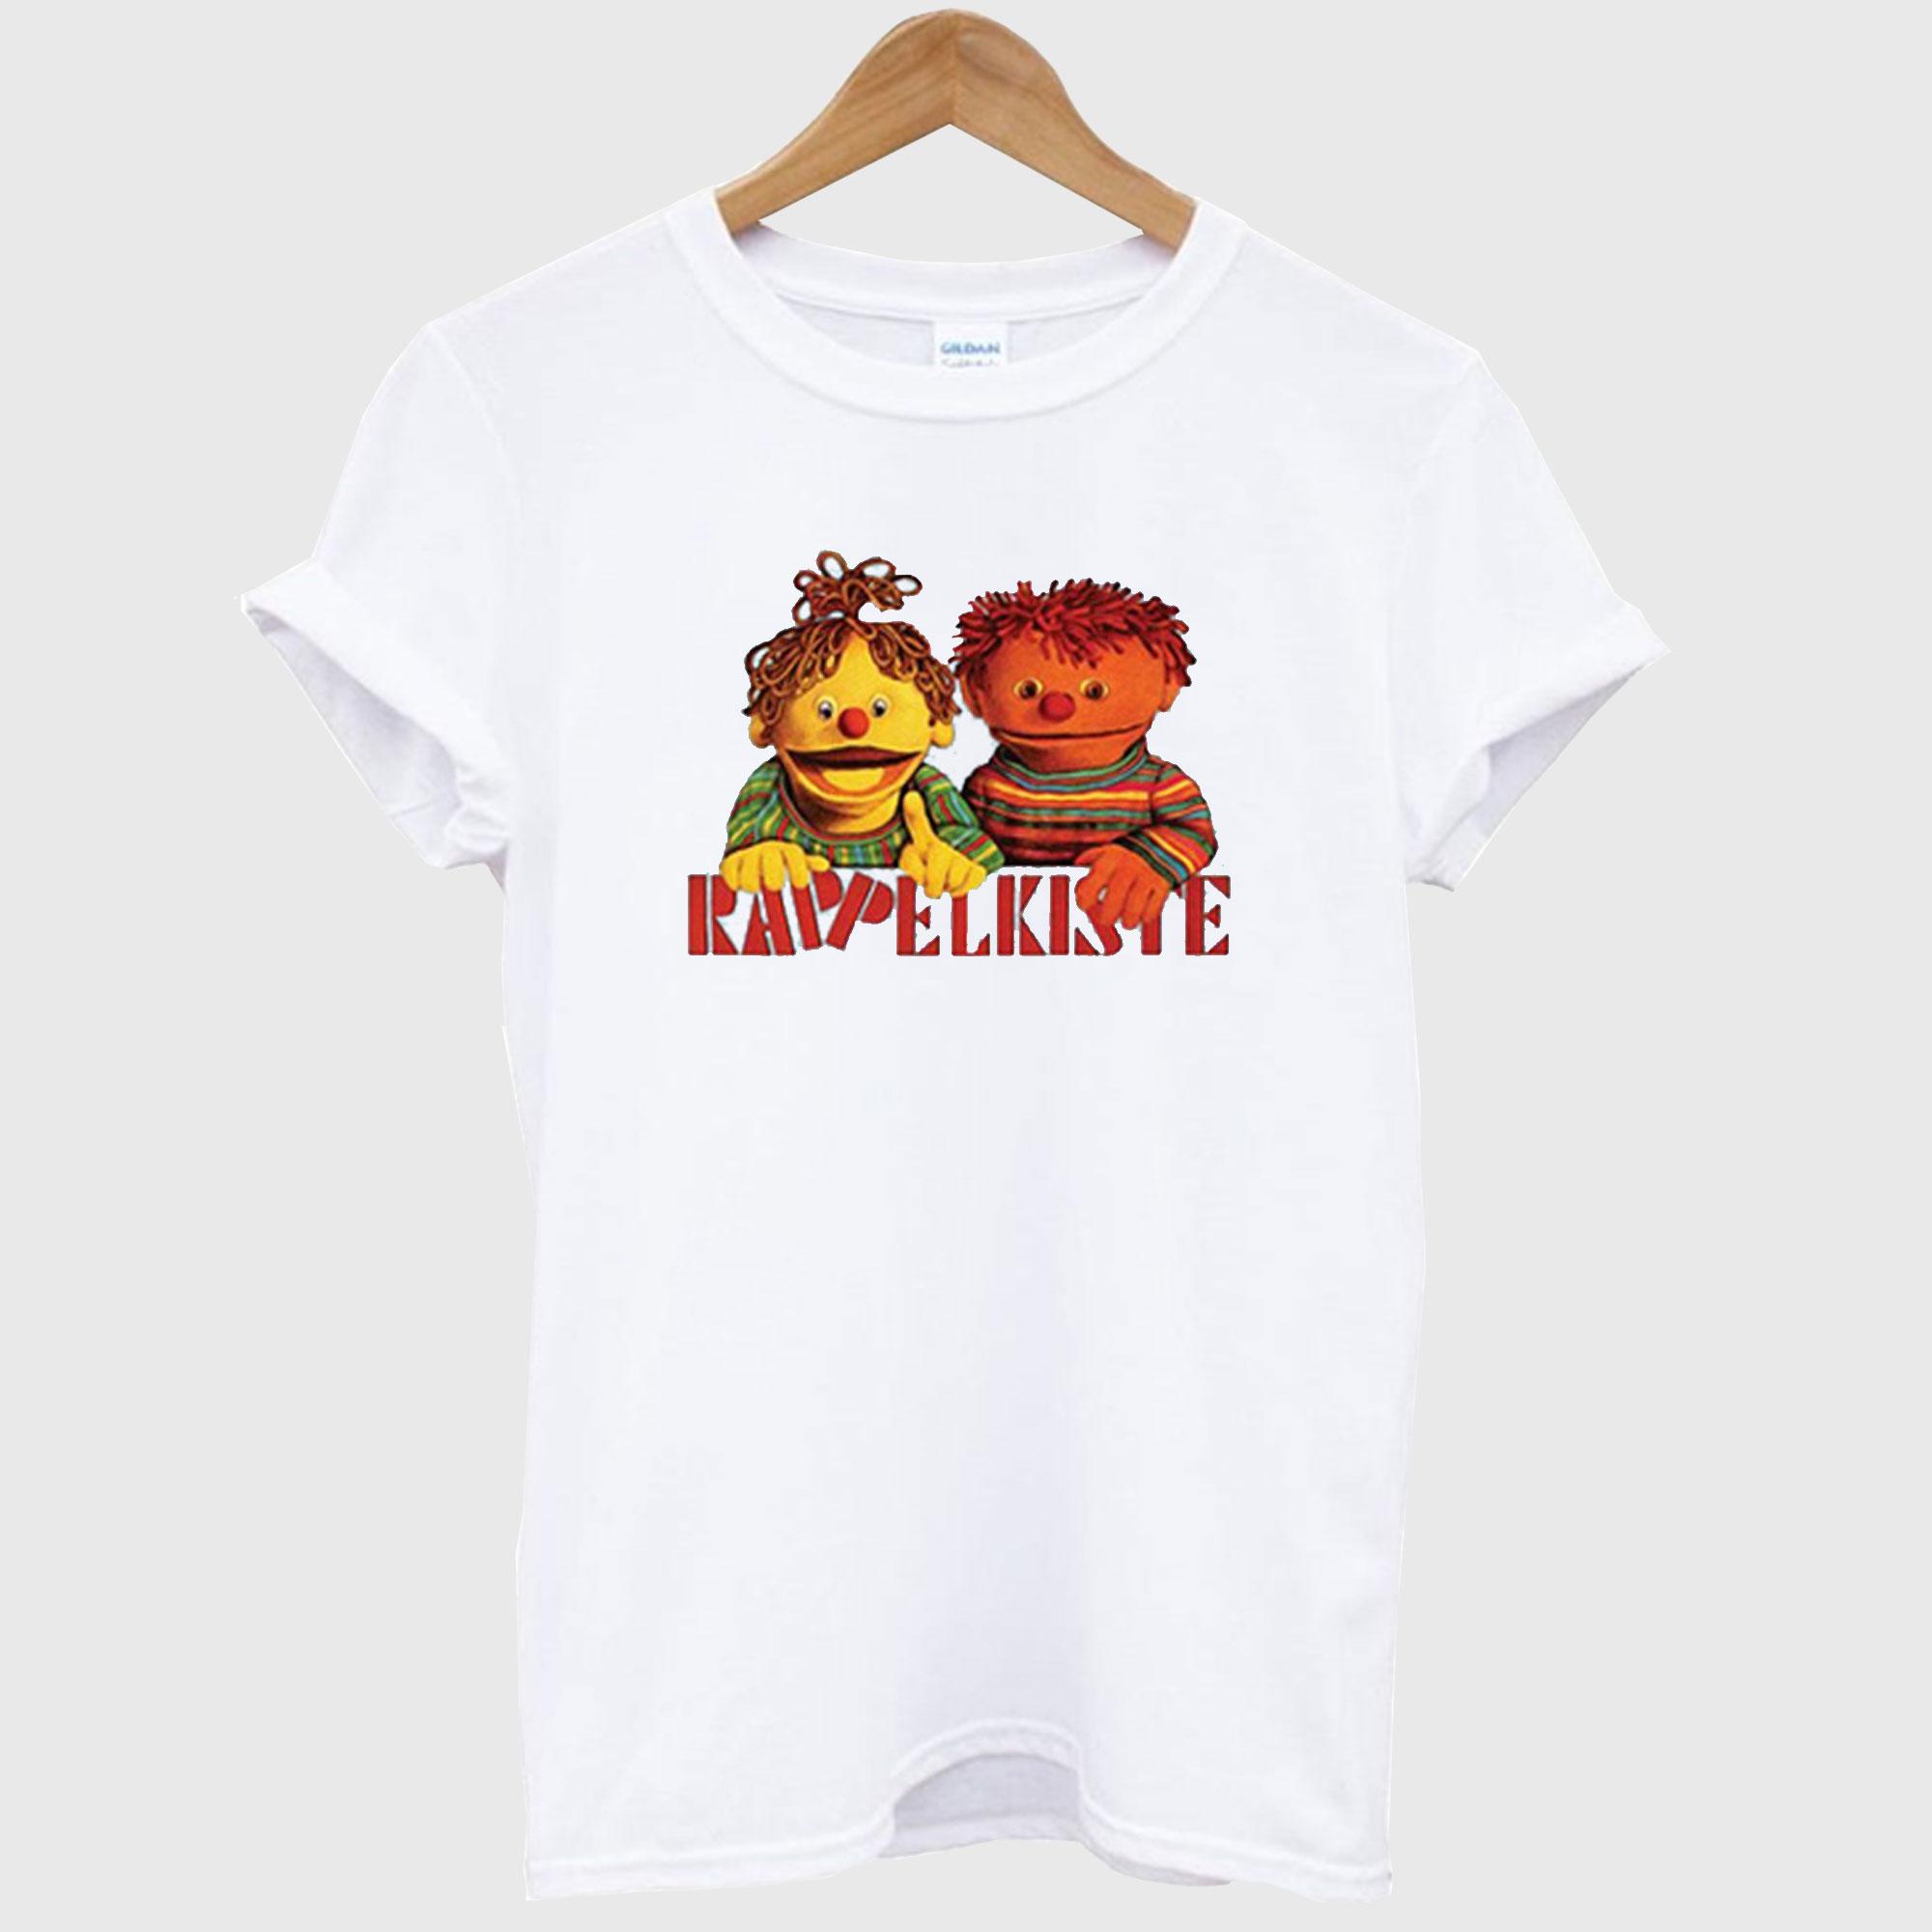 Rappelkiste T-shirt Unisex Tshirt